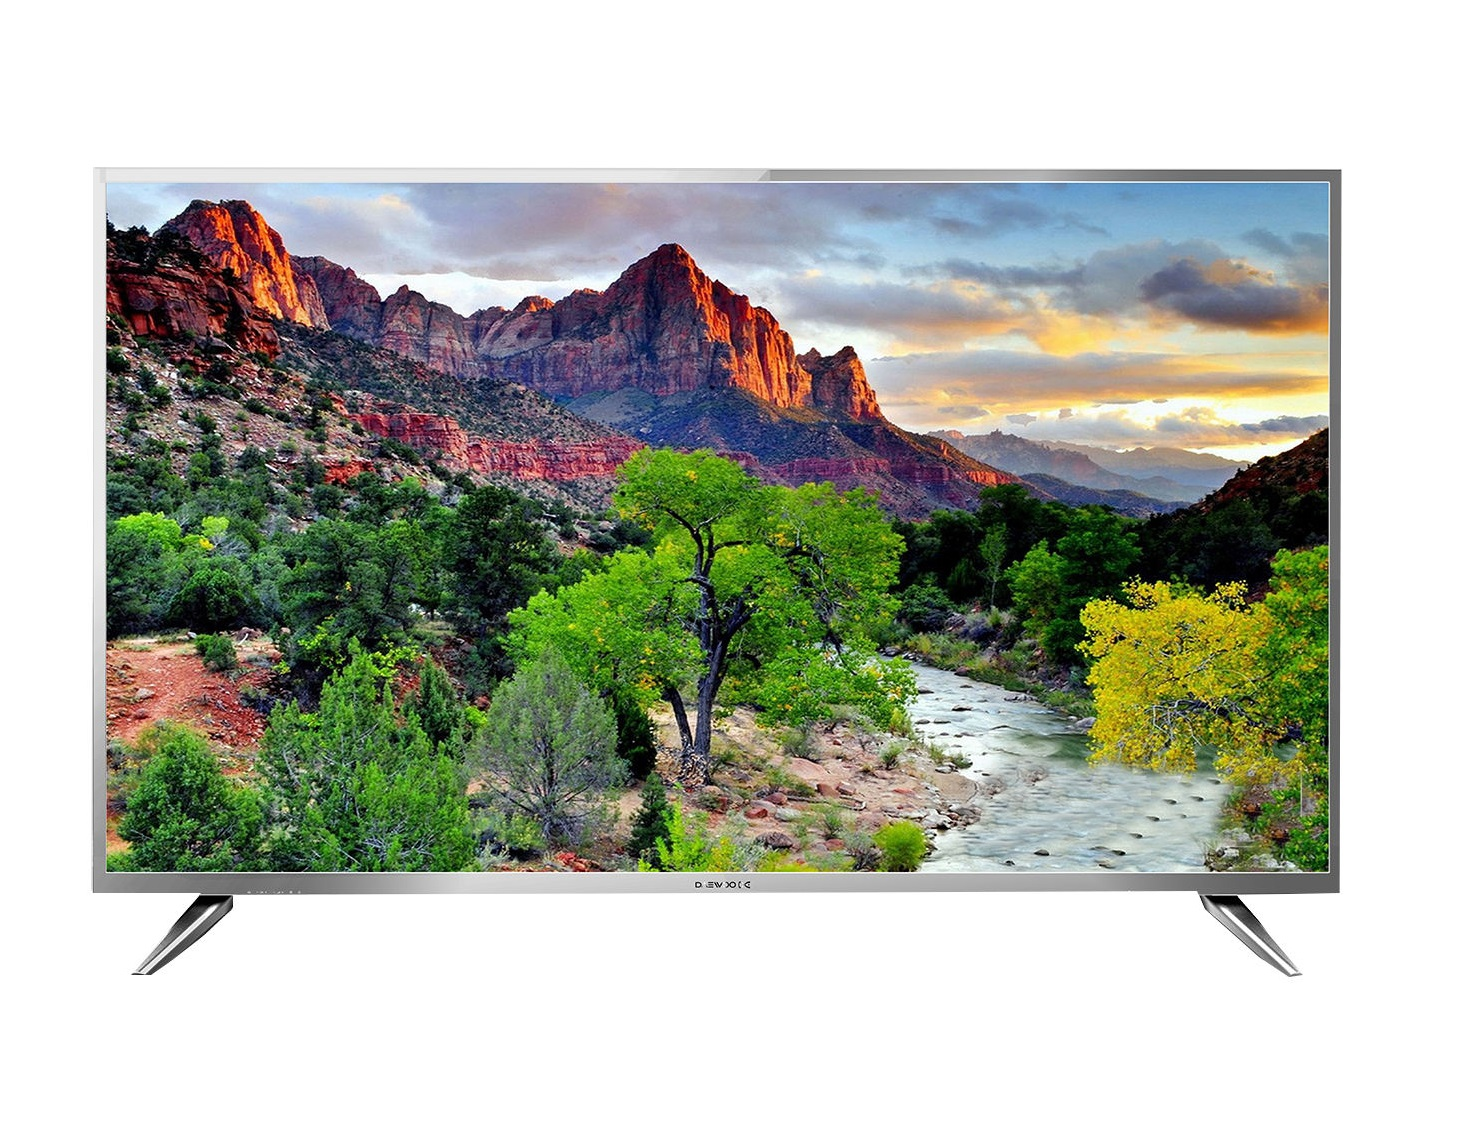 تلویزیون ال ای دی دوو سایز 55 اینچ مدل DLE-55H1900U